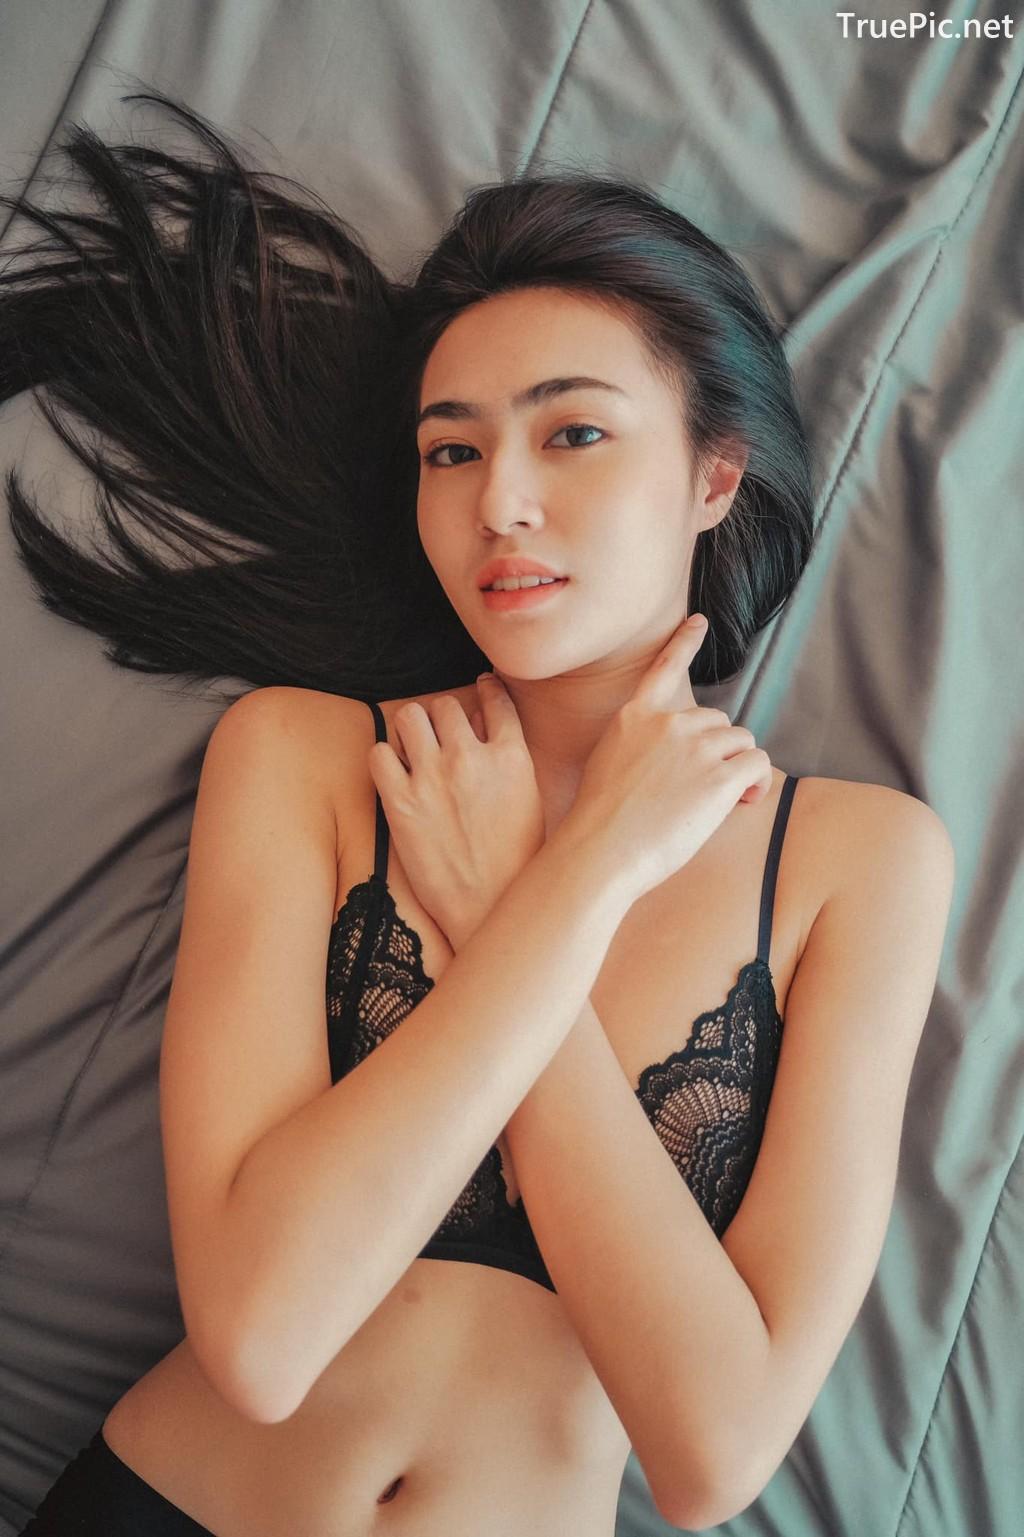 Image Thailand Sexy Model – Baifern Rinrucha Kamnark – Black Lingerie - TruePic.net - Picture-6